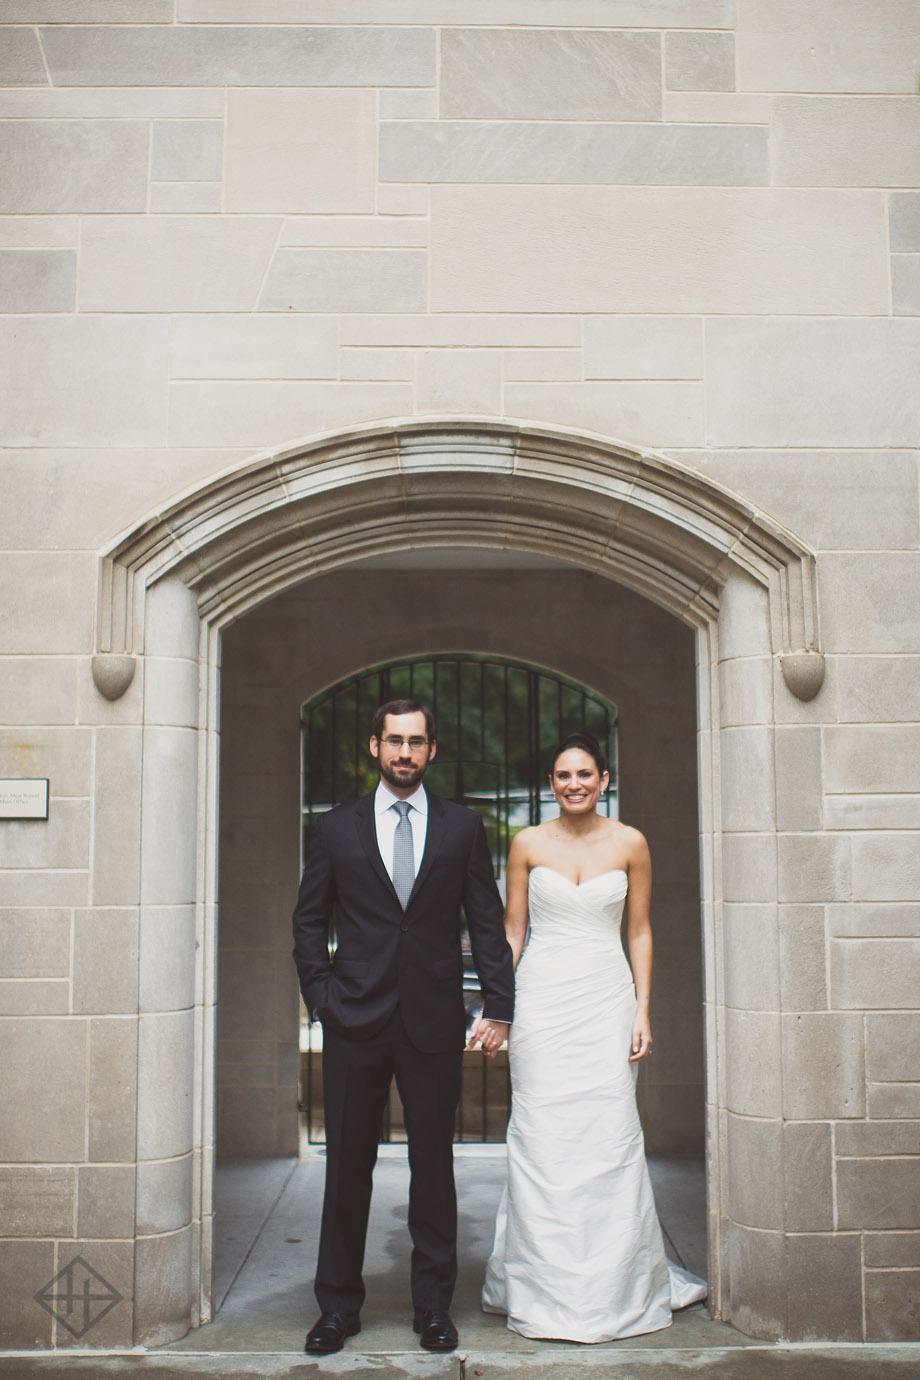 Atlanta Wedding Photography: Atlanta Wedding Photography: Cathedral Of Christ The King